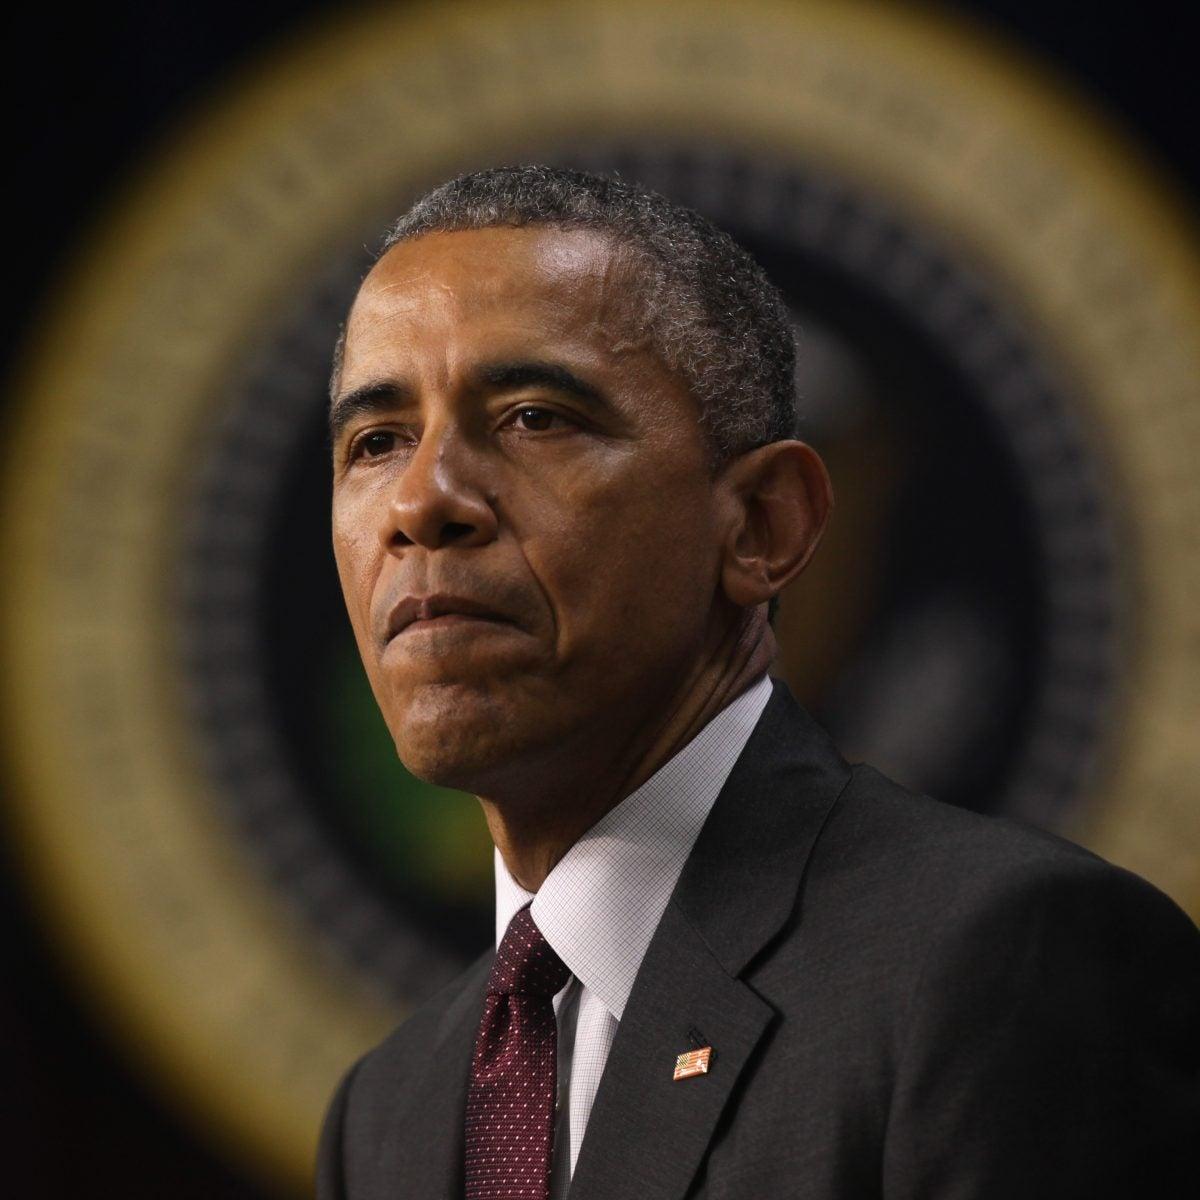 Barack Obama Calls MAGA Attack At U.S. Capitol 'A Moment Of Great Dishonor And Shame'